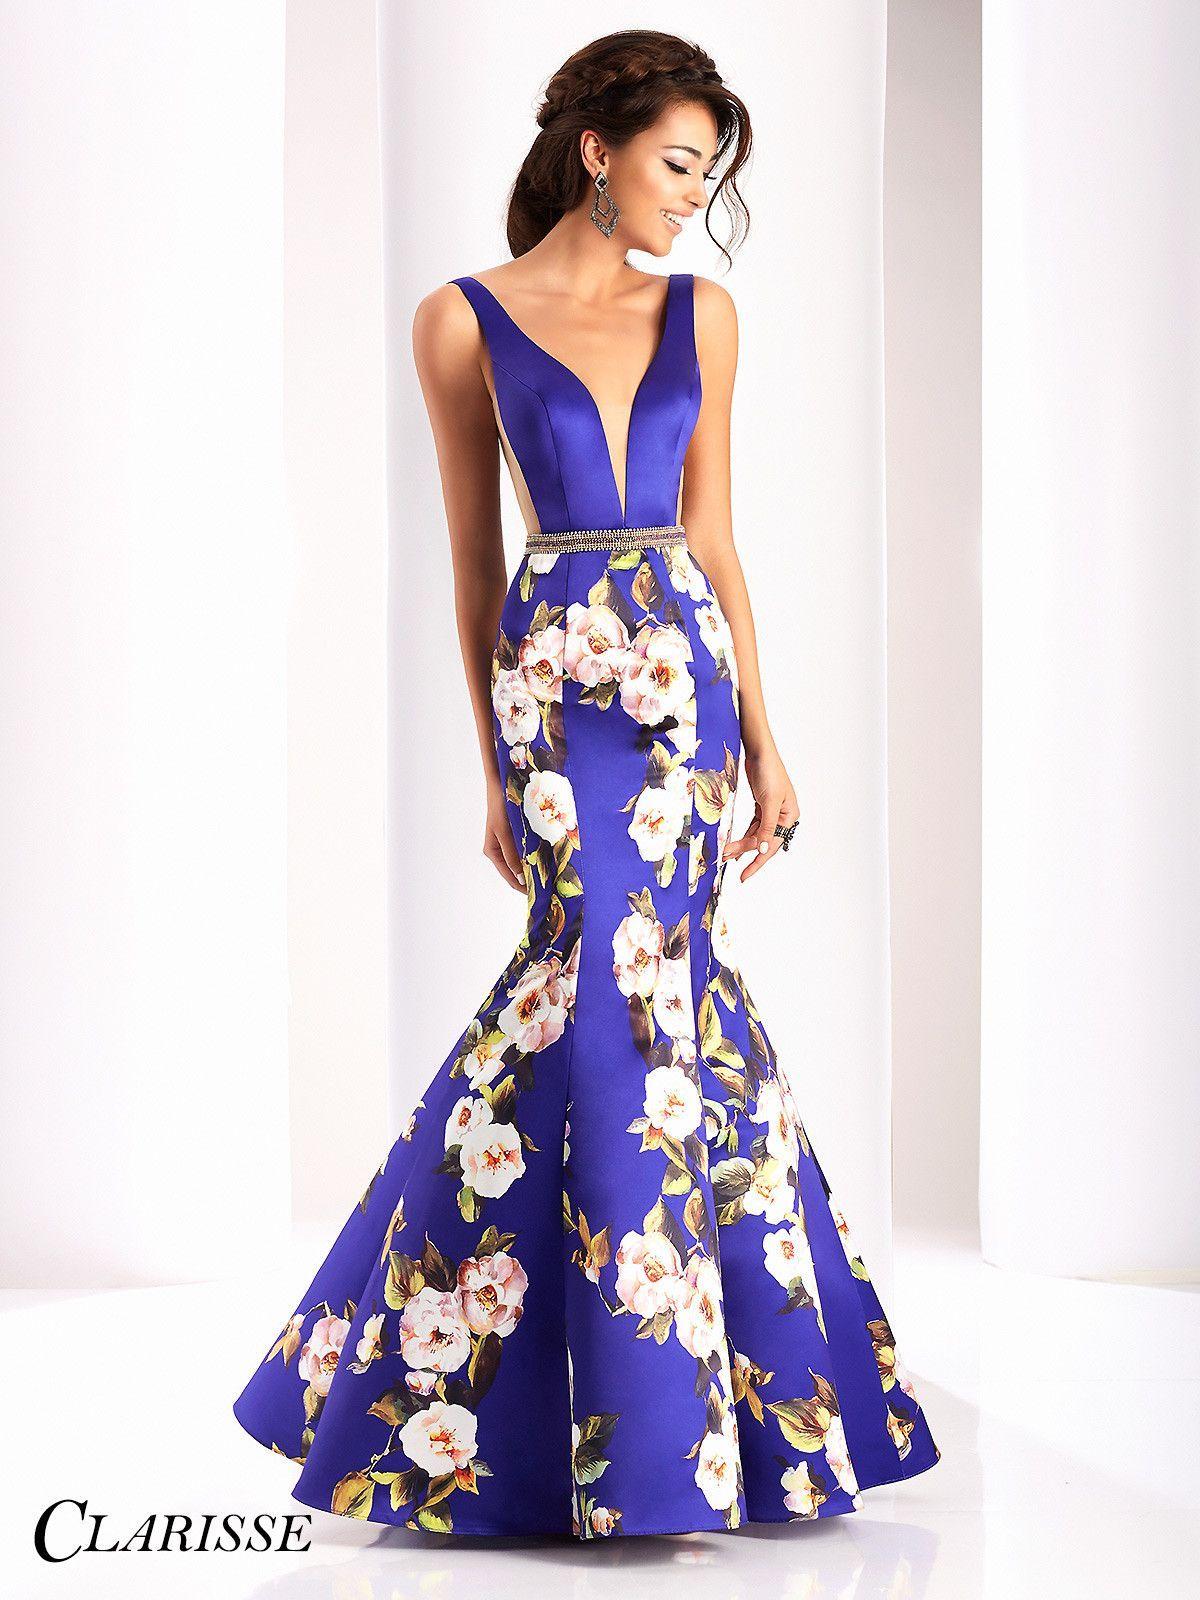 Clarisse Couture Dress 4813